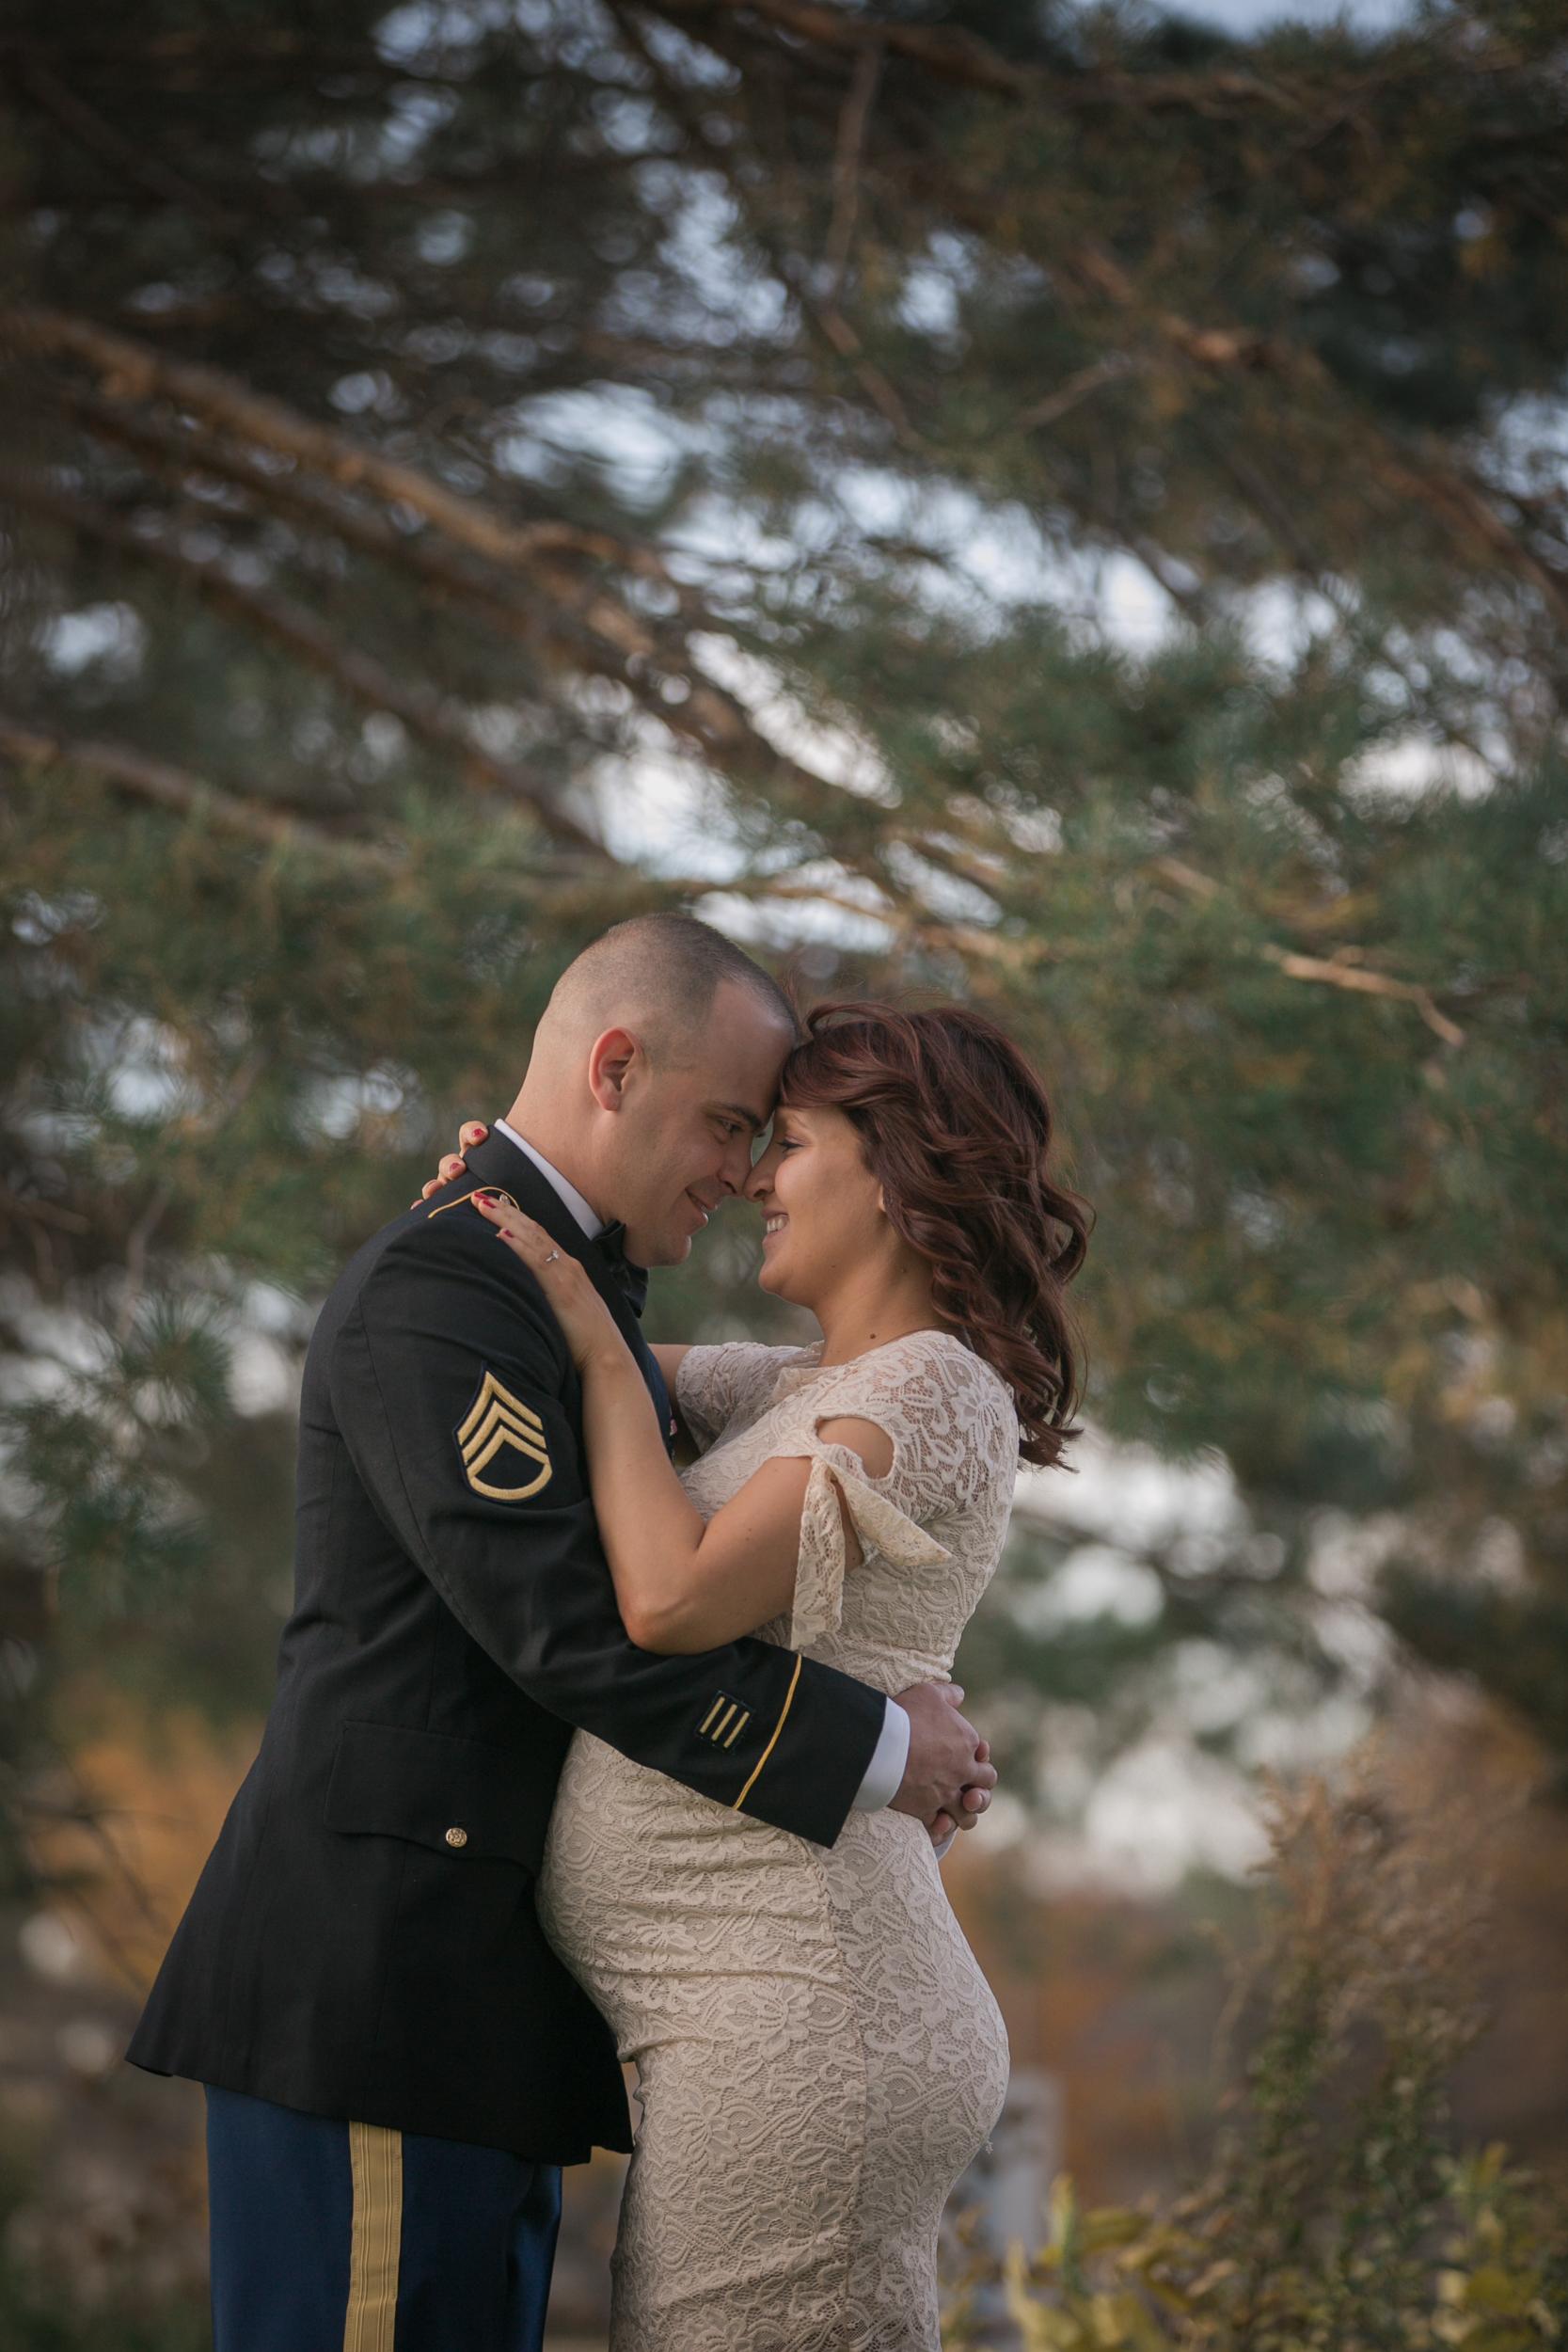 Fort Snelling Elopement St. Paul, MN, Fort Snelling Elopement, Military Elopement, Intimate Military Wedding, intimate elopement wedding-www.rachelsmak.com16.jpg